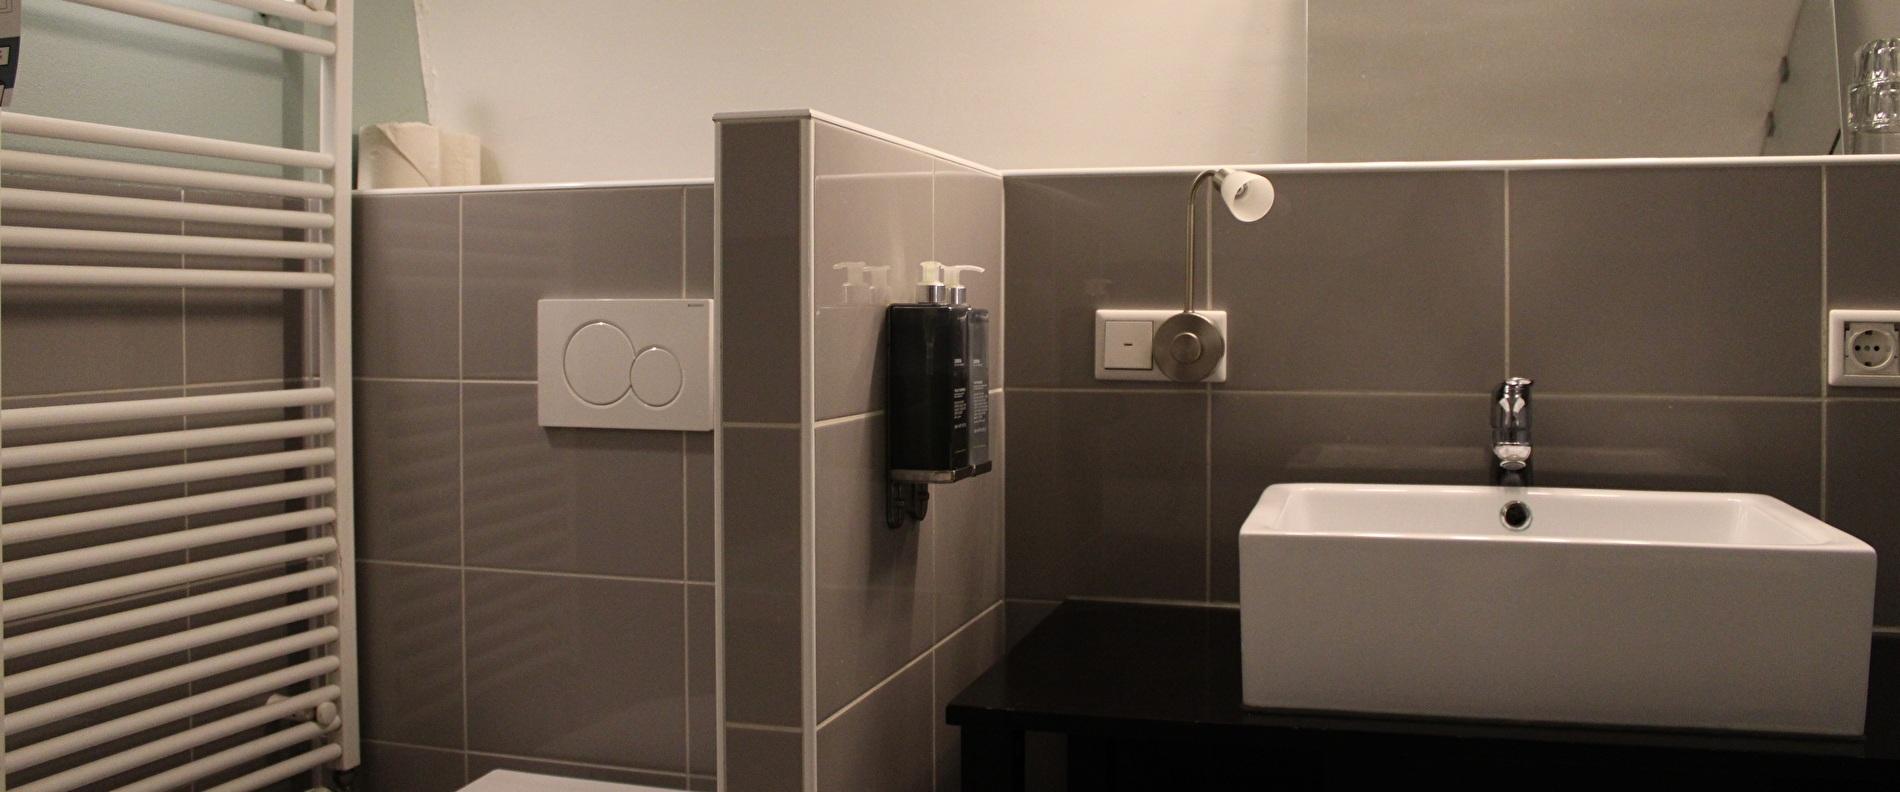 Court Canal Room Bathroom